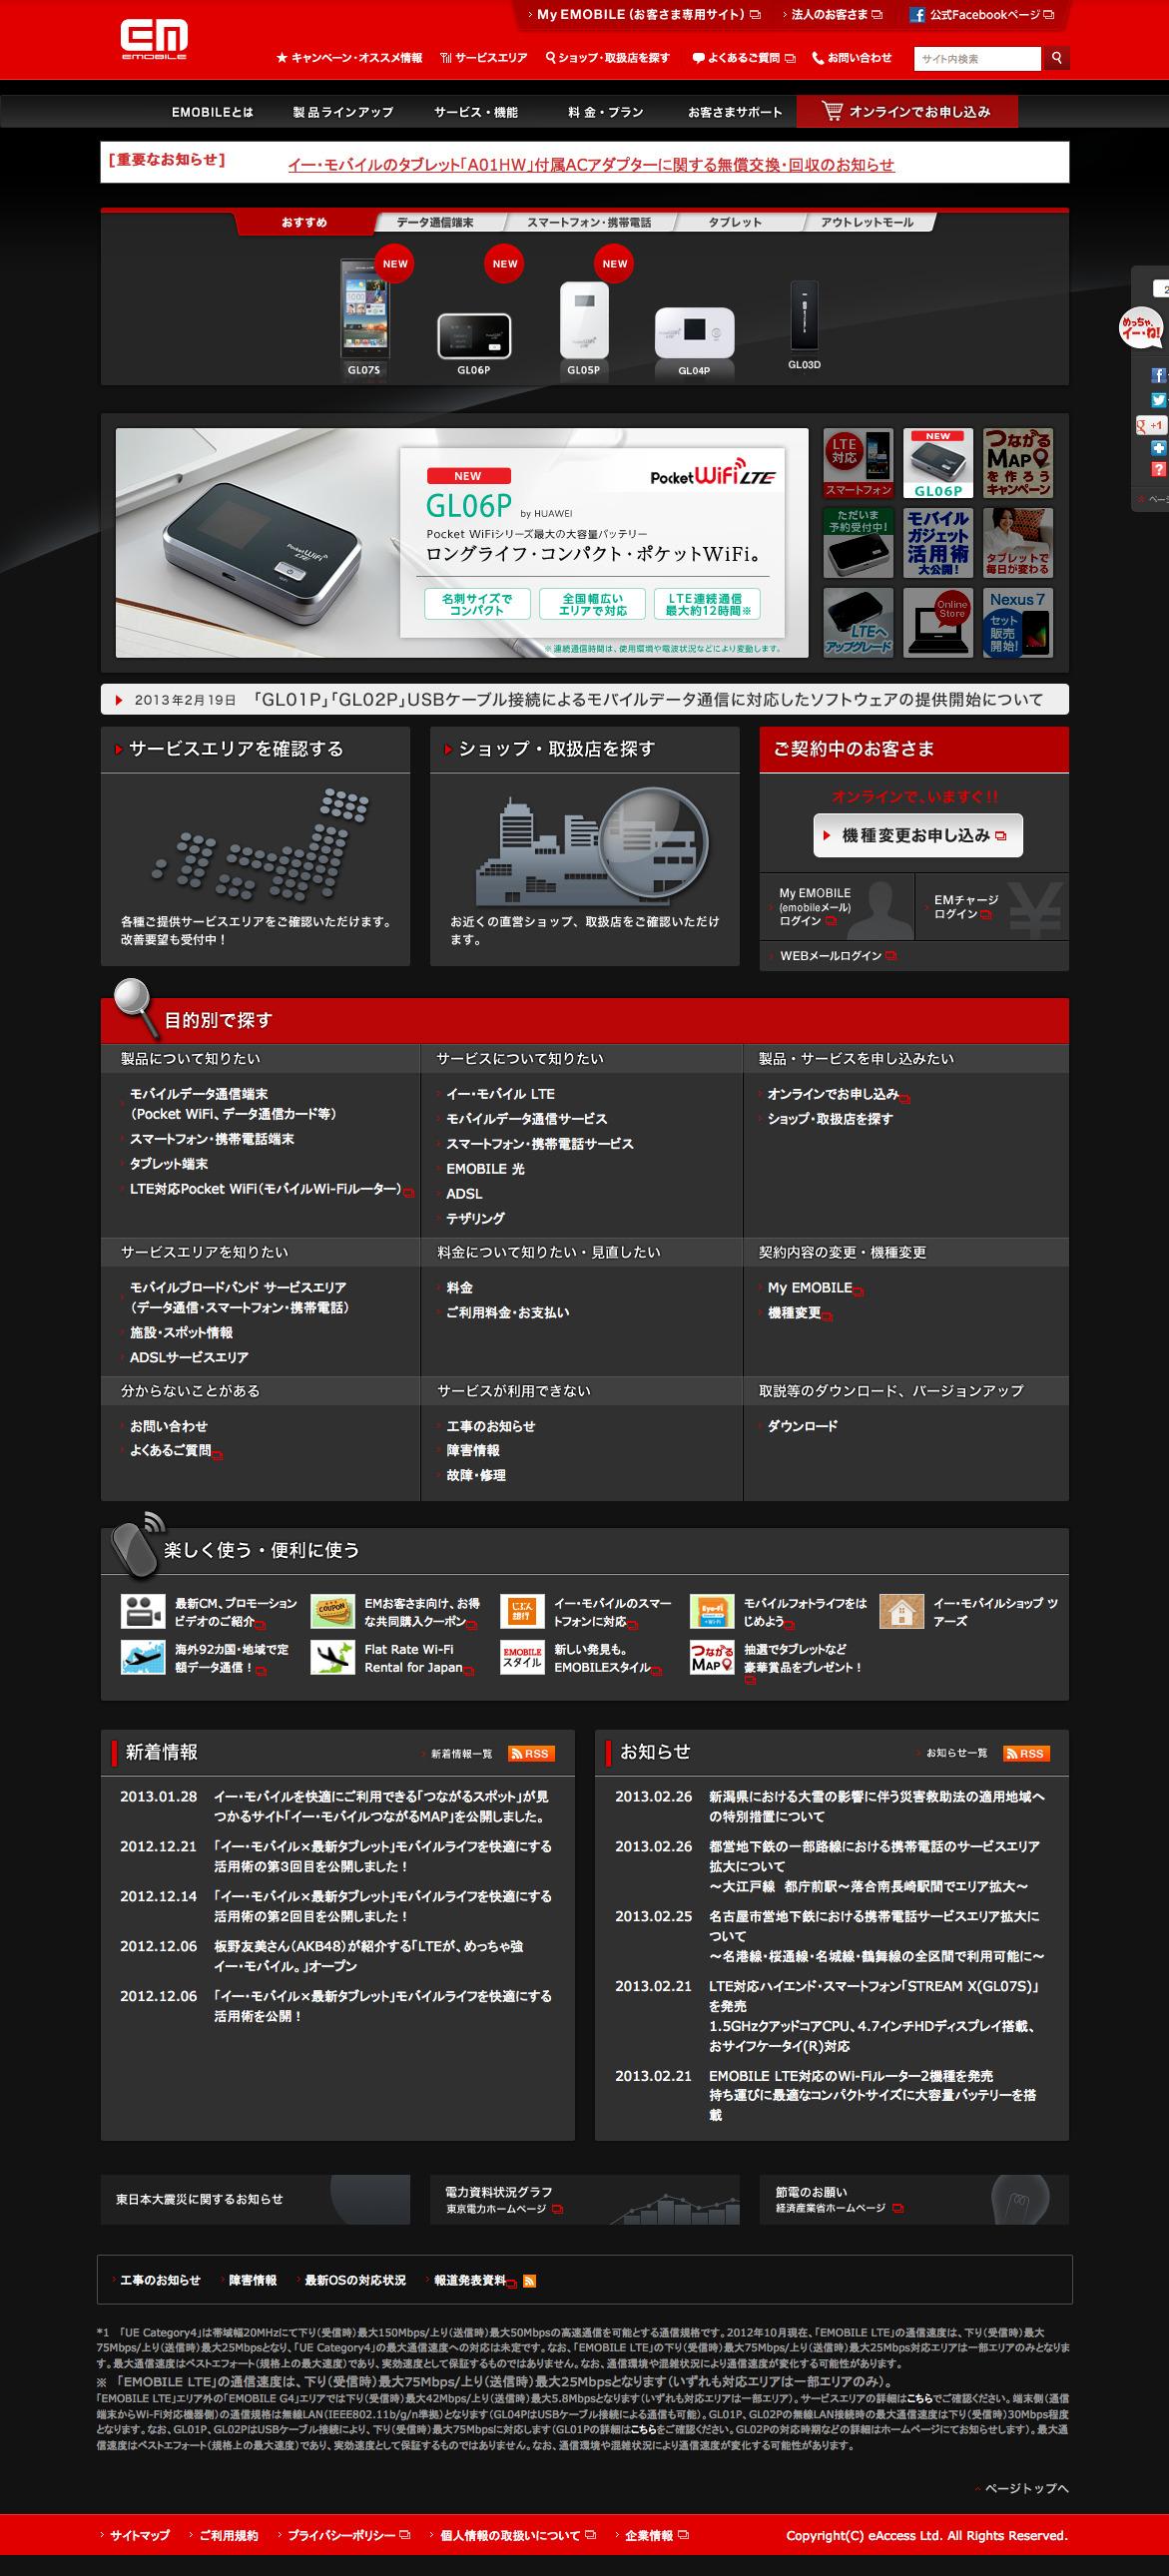 【EM】イー・モバイル公式サイト(イー・アクセス株式会社)